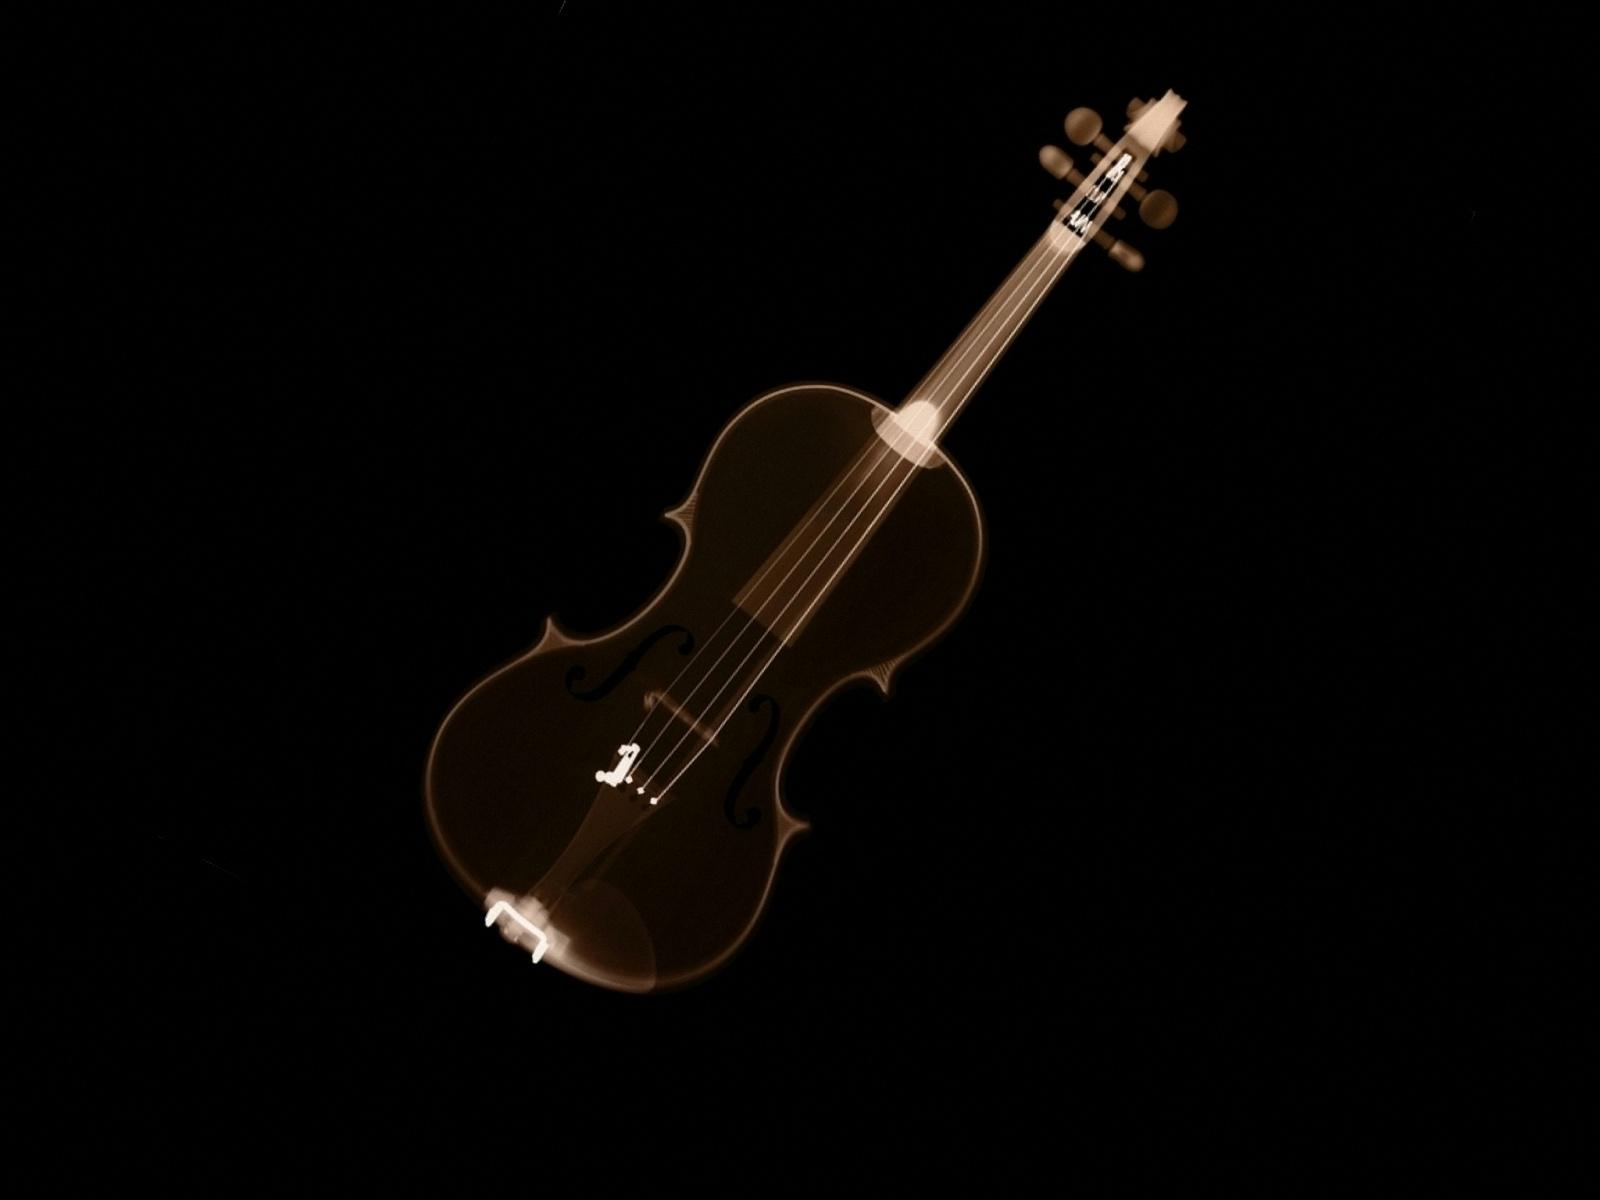 Violin Wallpaper: IPhone Violin Wallpaper